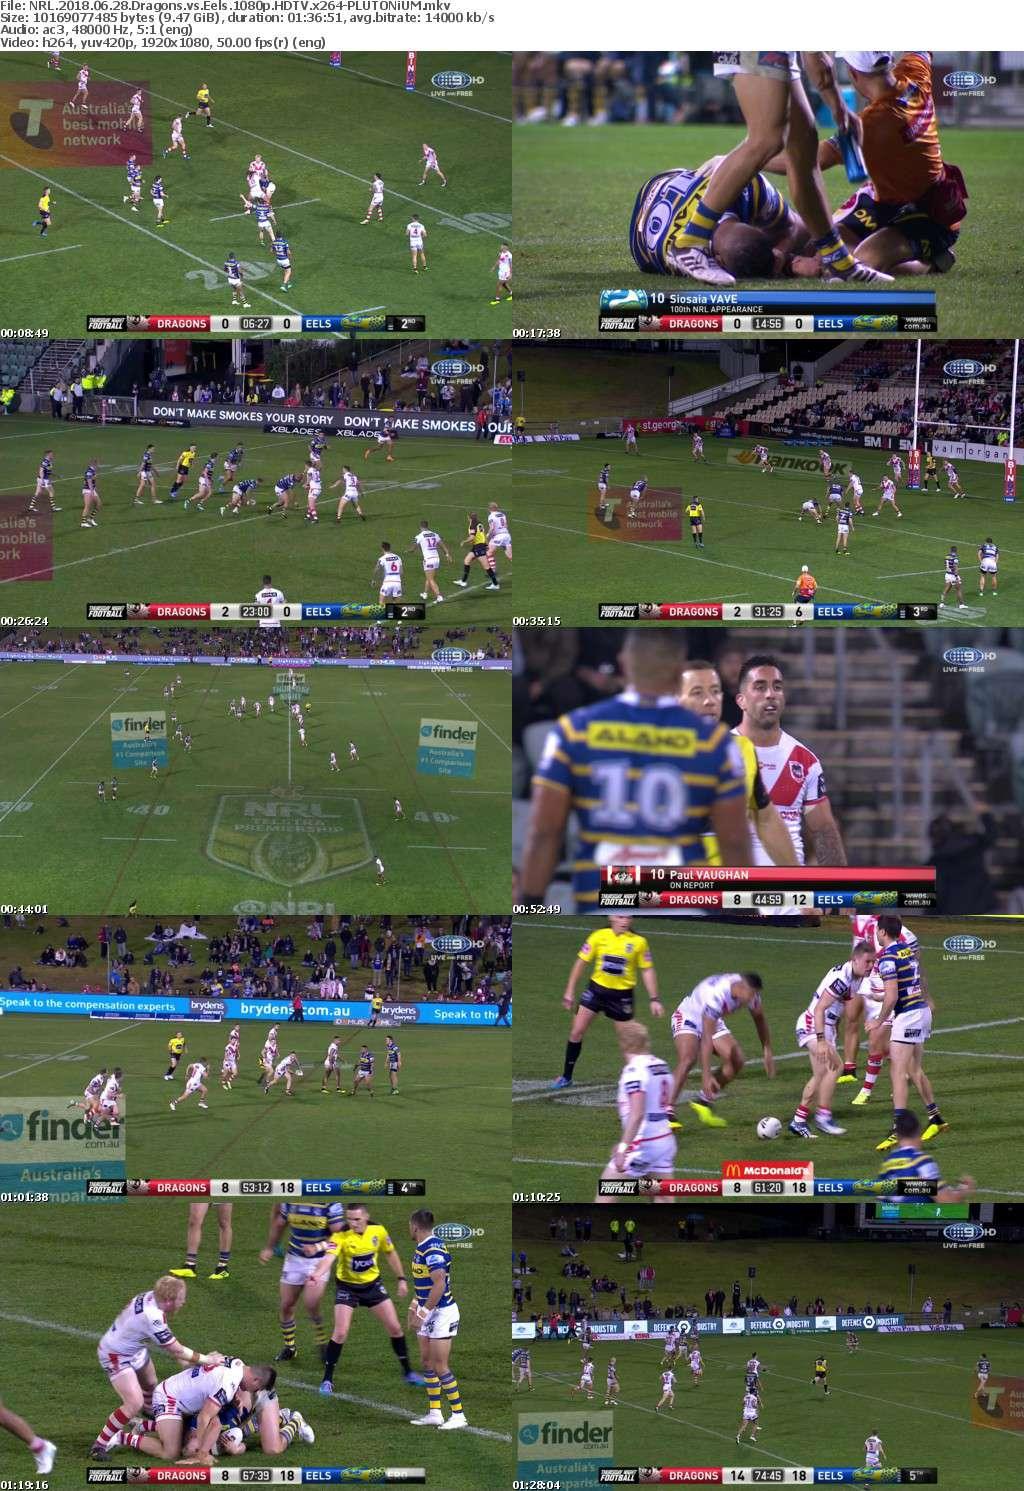 NRL 2018 06 28 Dragons vs Eels 1080p HDTV x264-PLUTONiUM